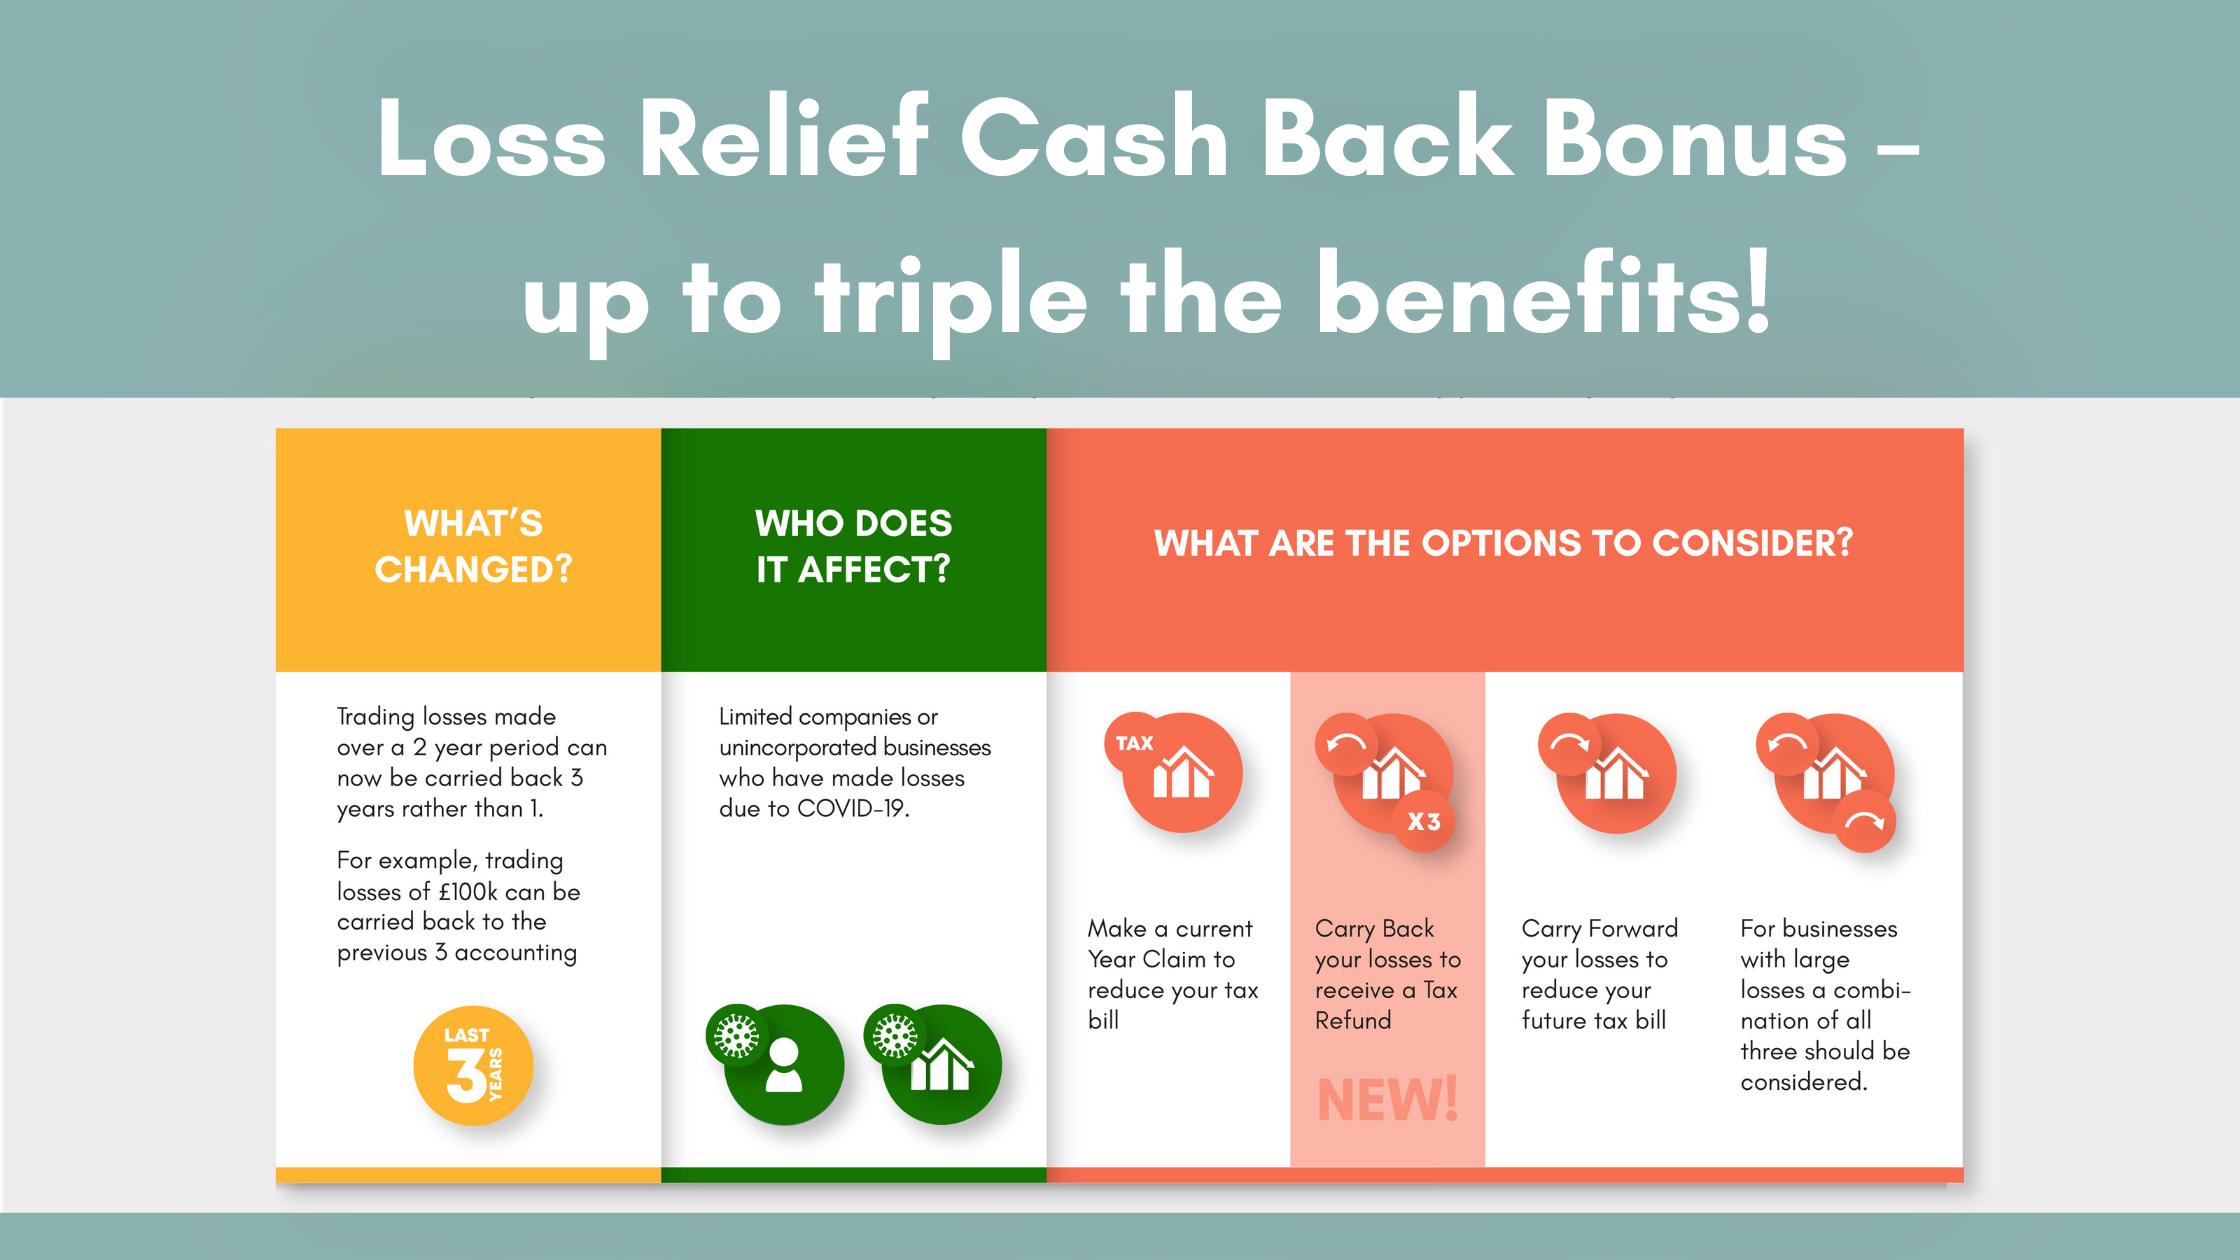 Loss Relief Cash Back Bonus - Up to triple the benefits!